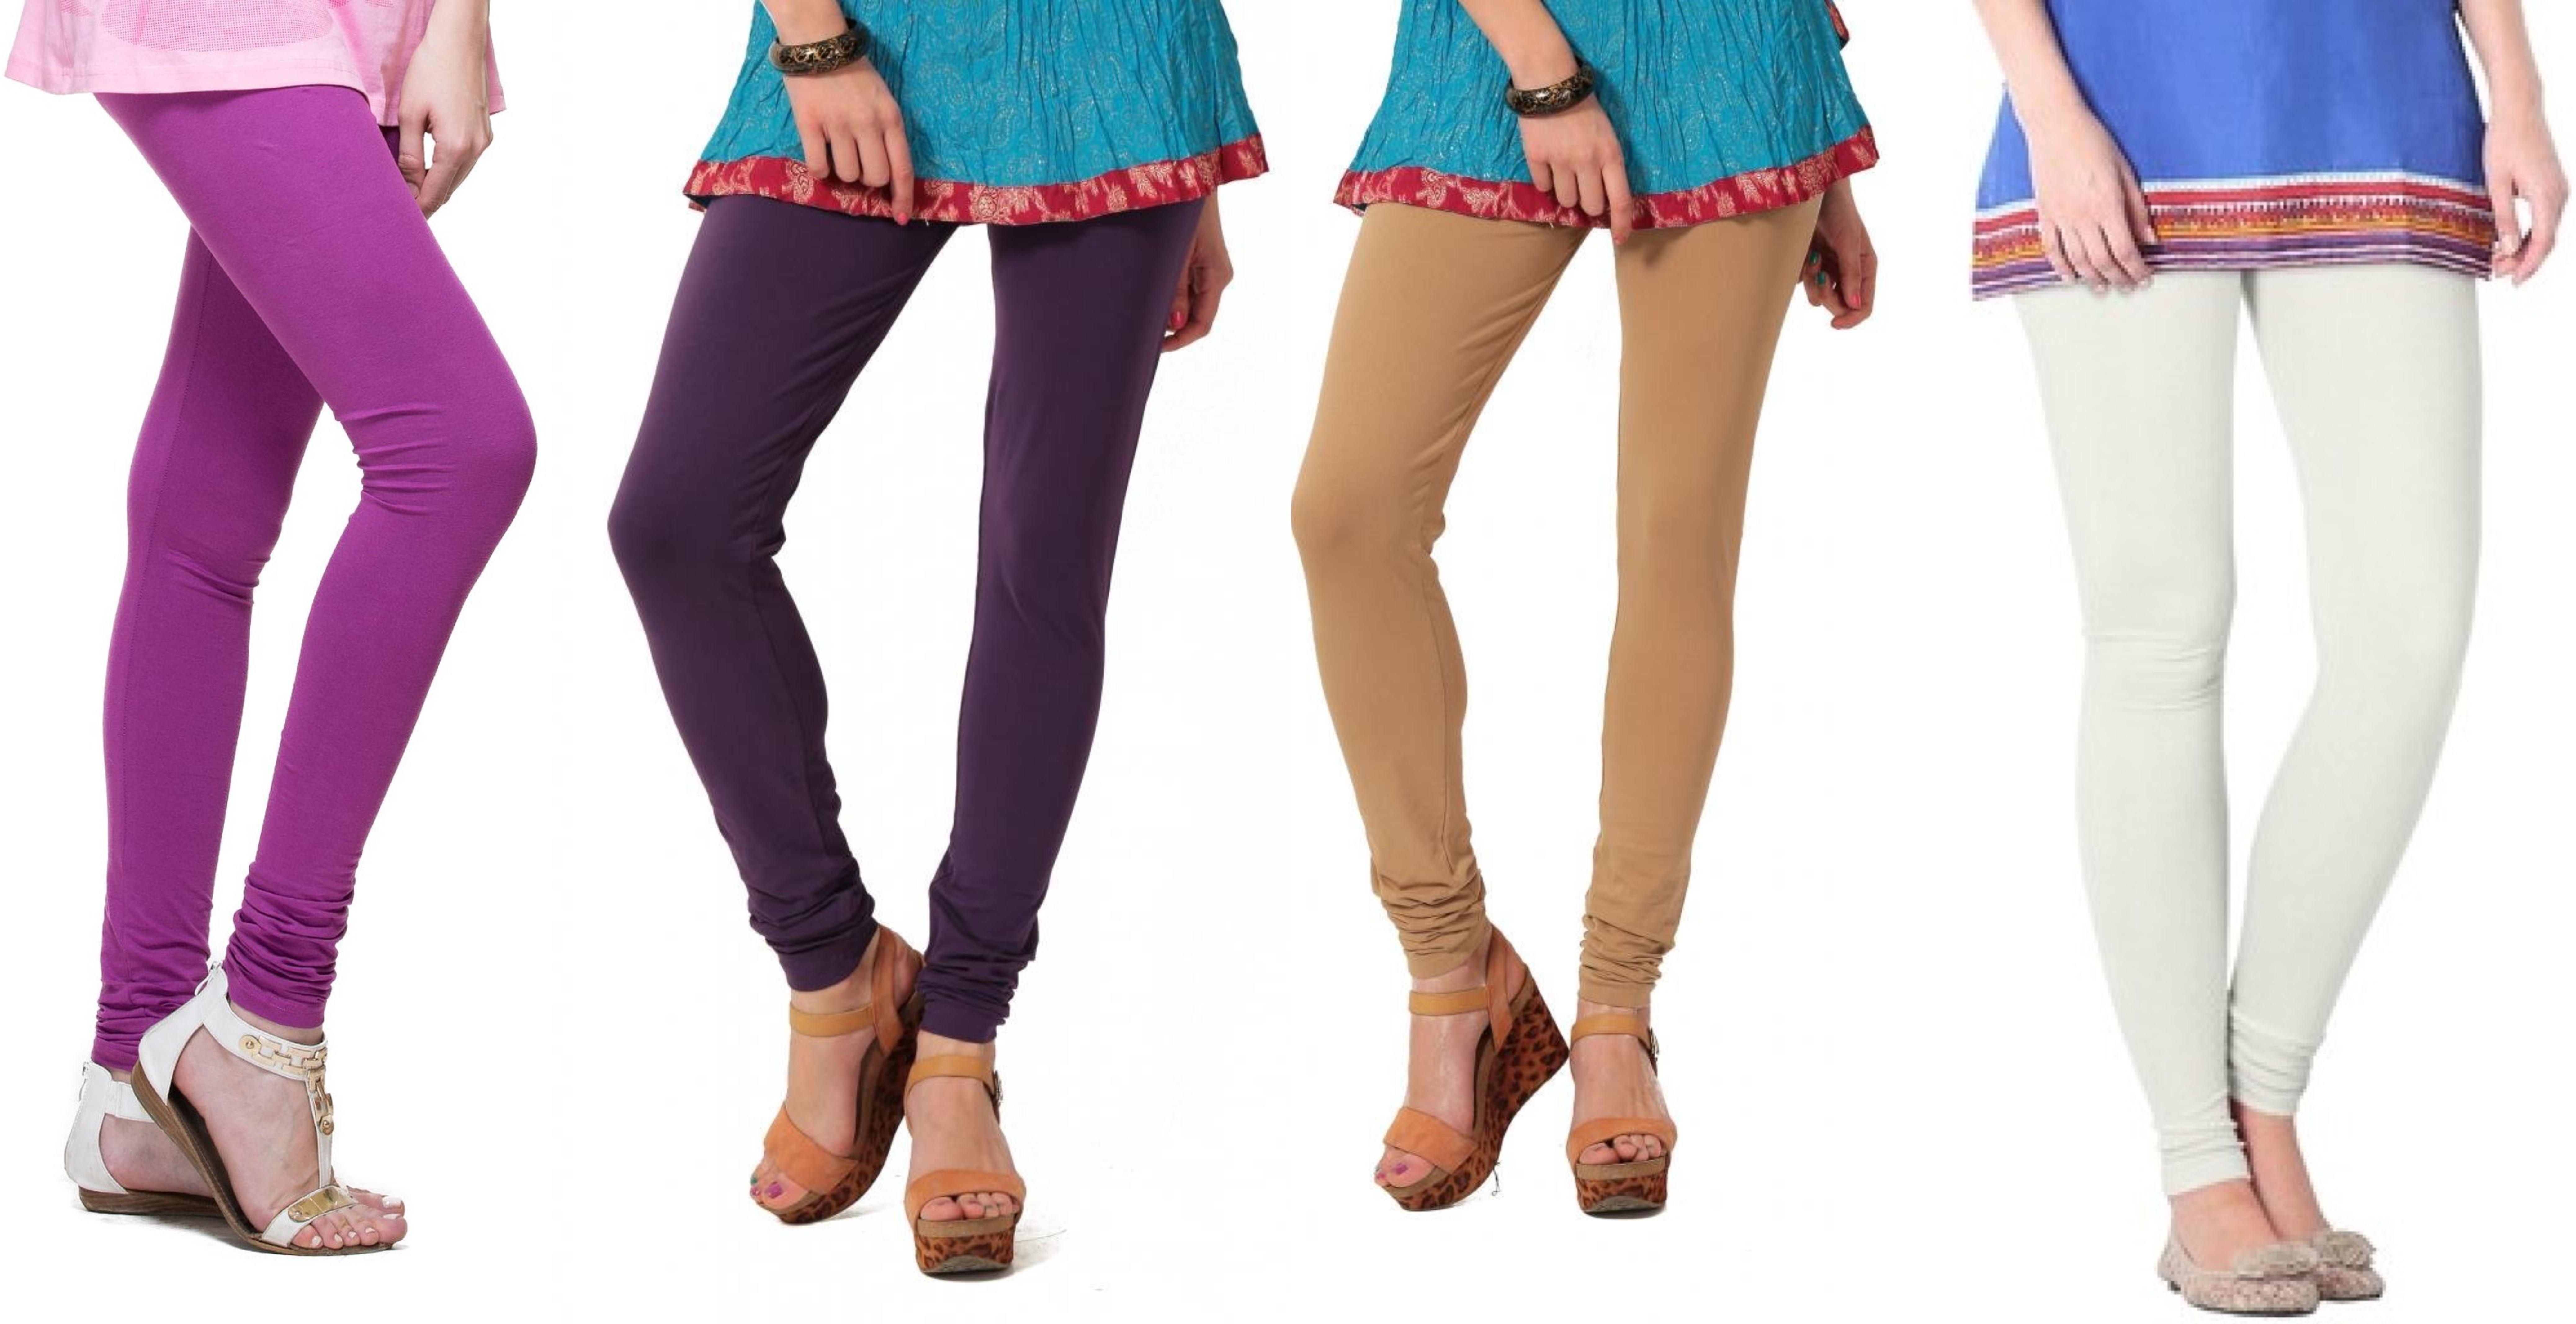 Angel Soft Womens Purple, Purple, Beige, White Leggings(Pack of 4)